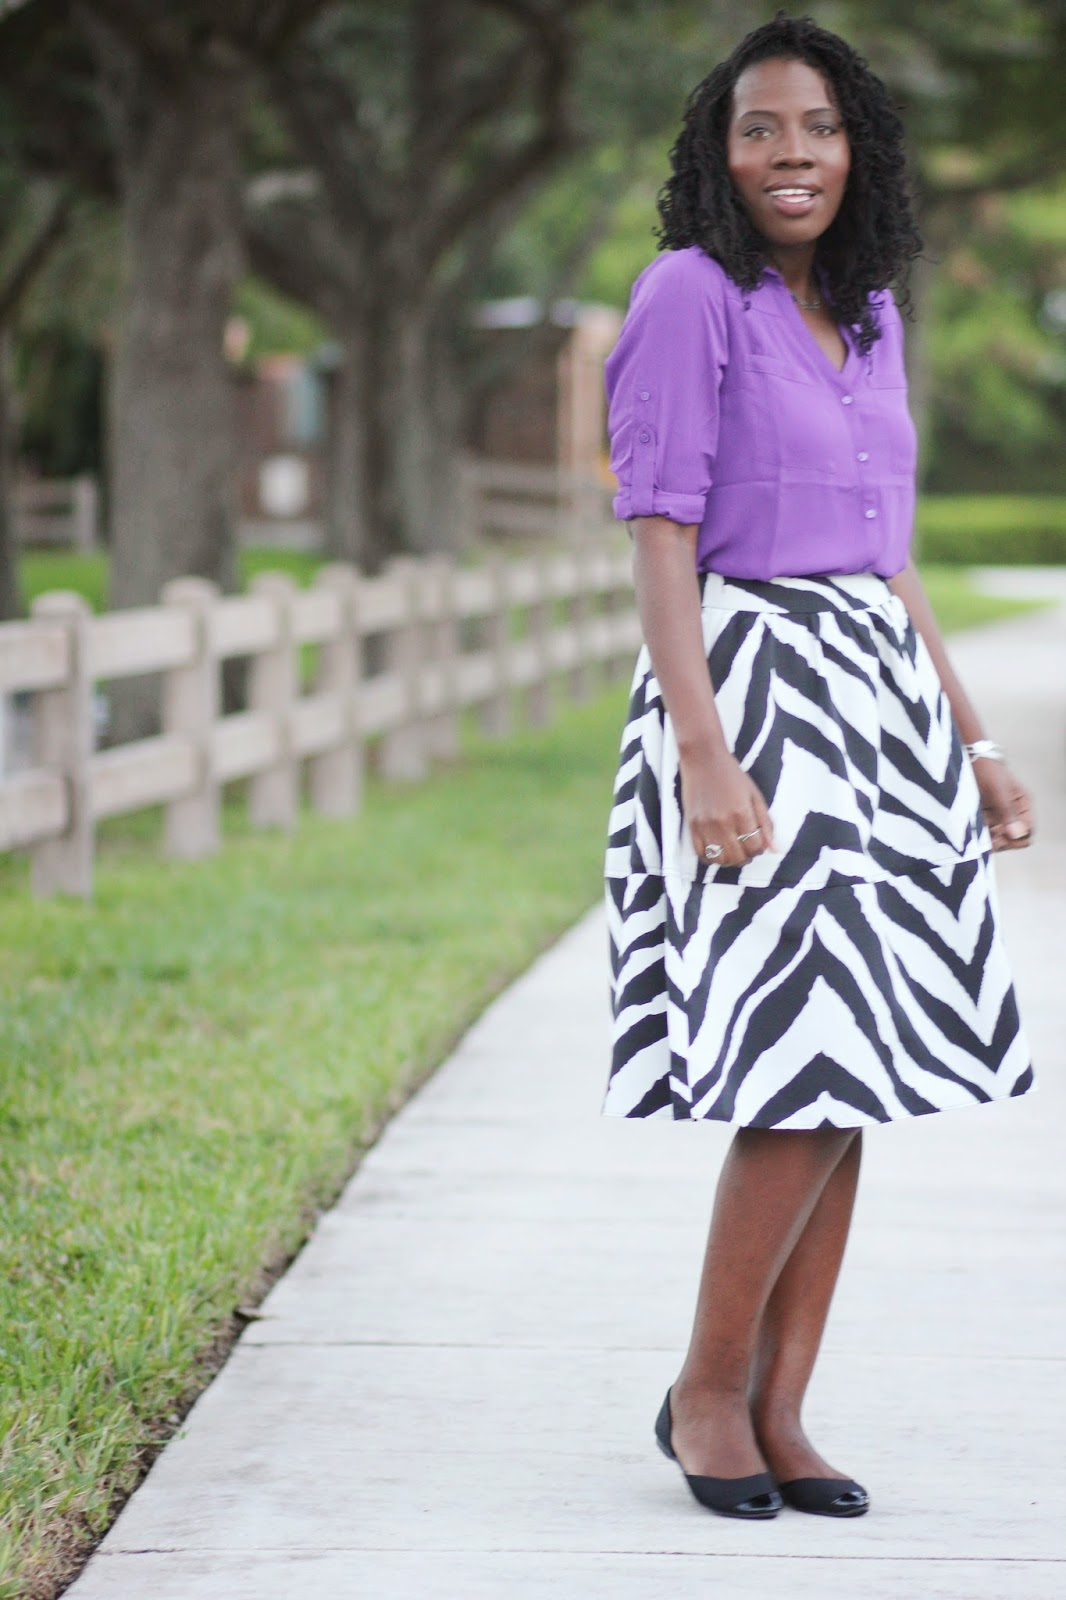 Kreyola's Journeys: What I Wore: Zebra Midi Skirt